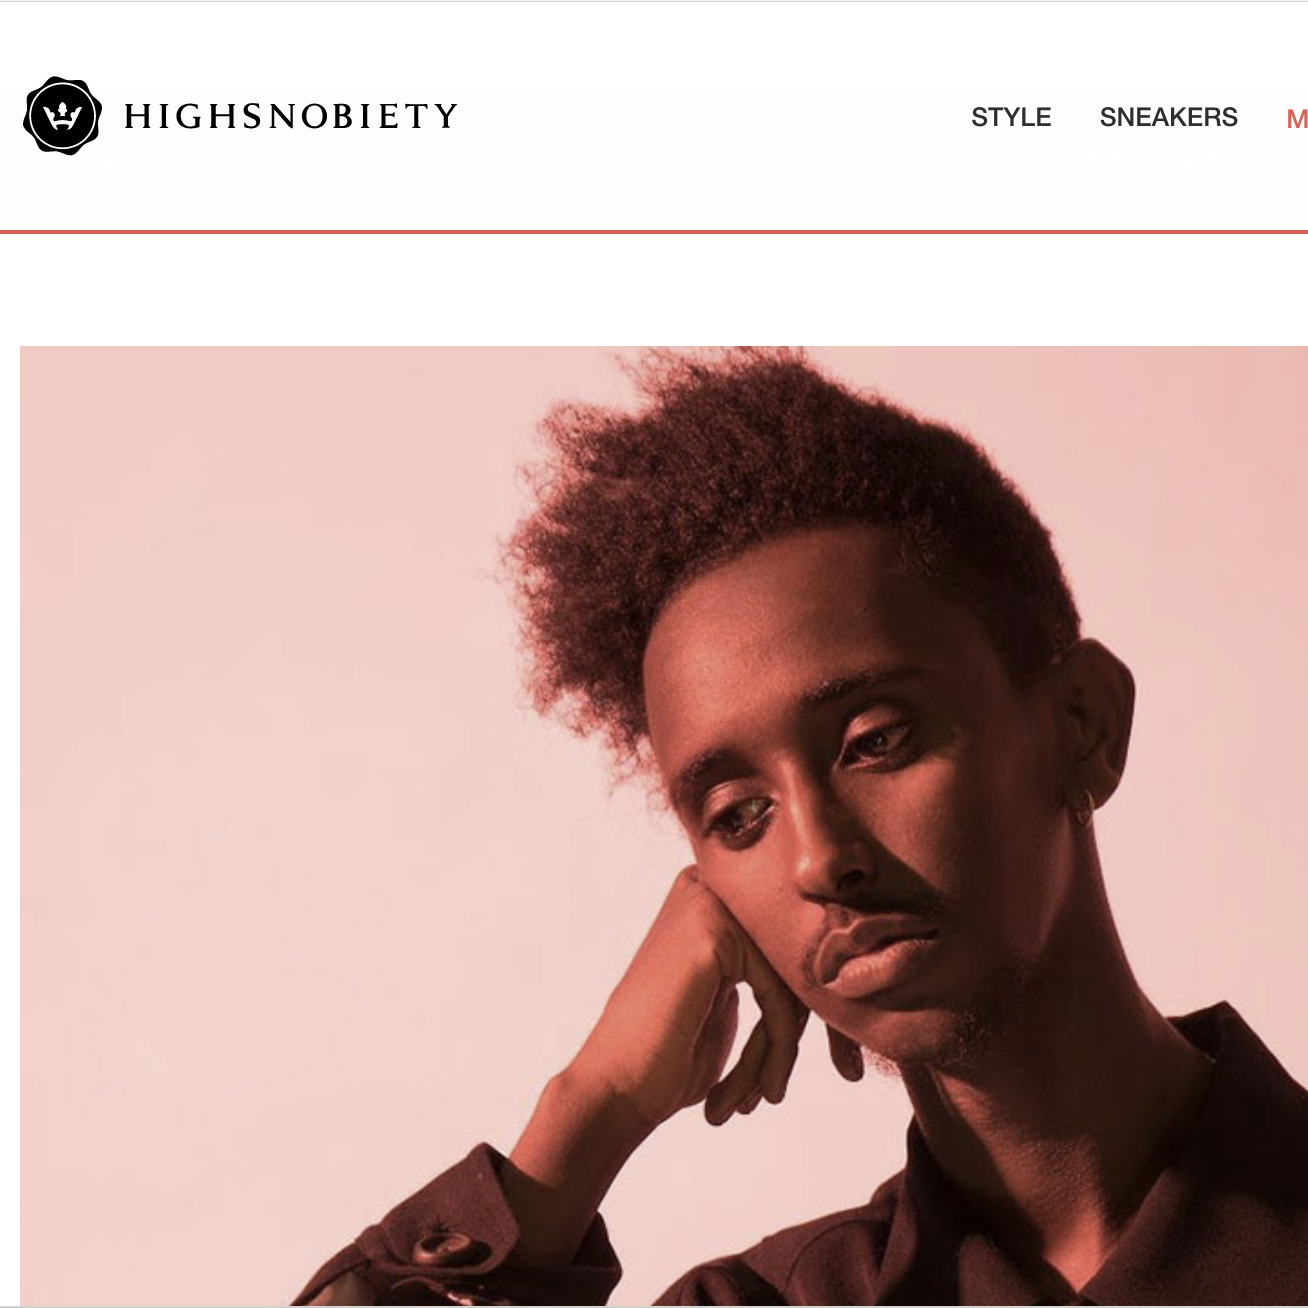 HighSnobiety - March 9th 2018